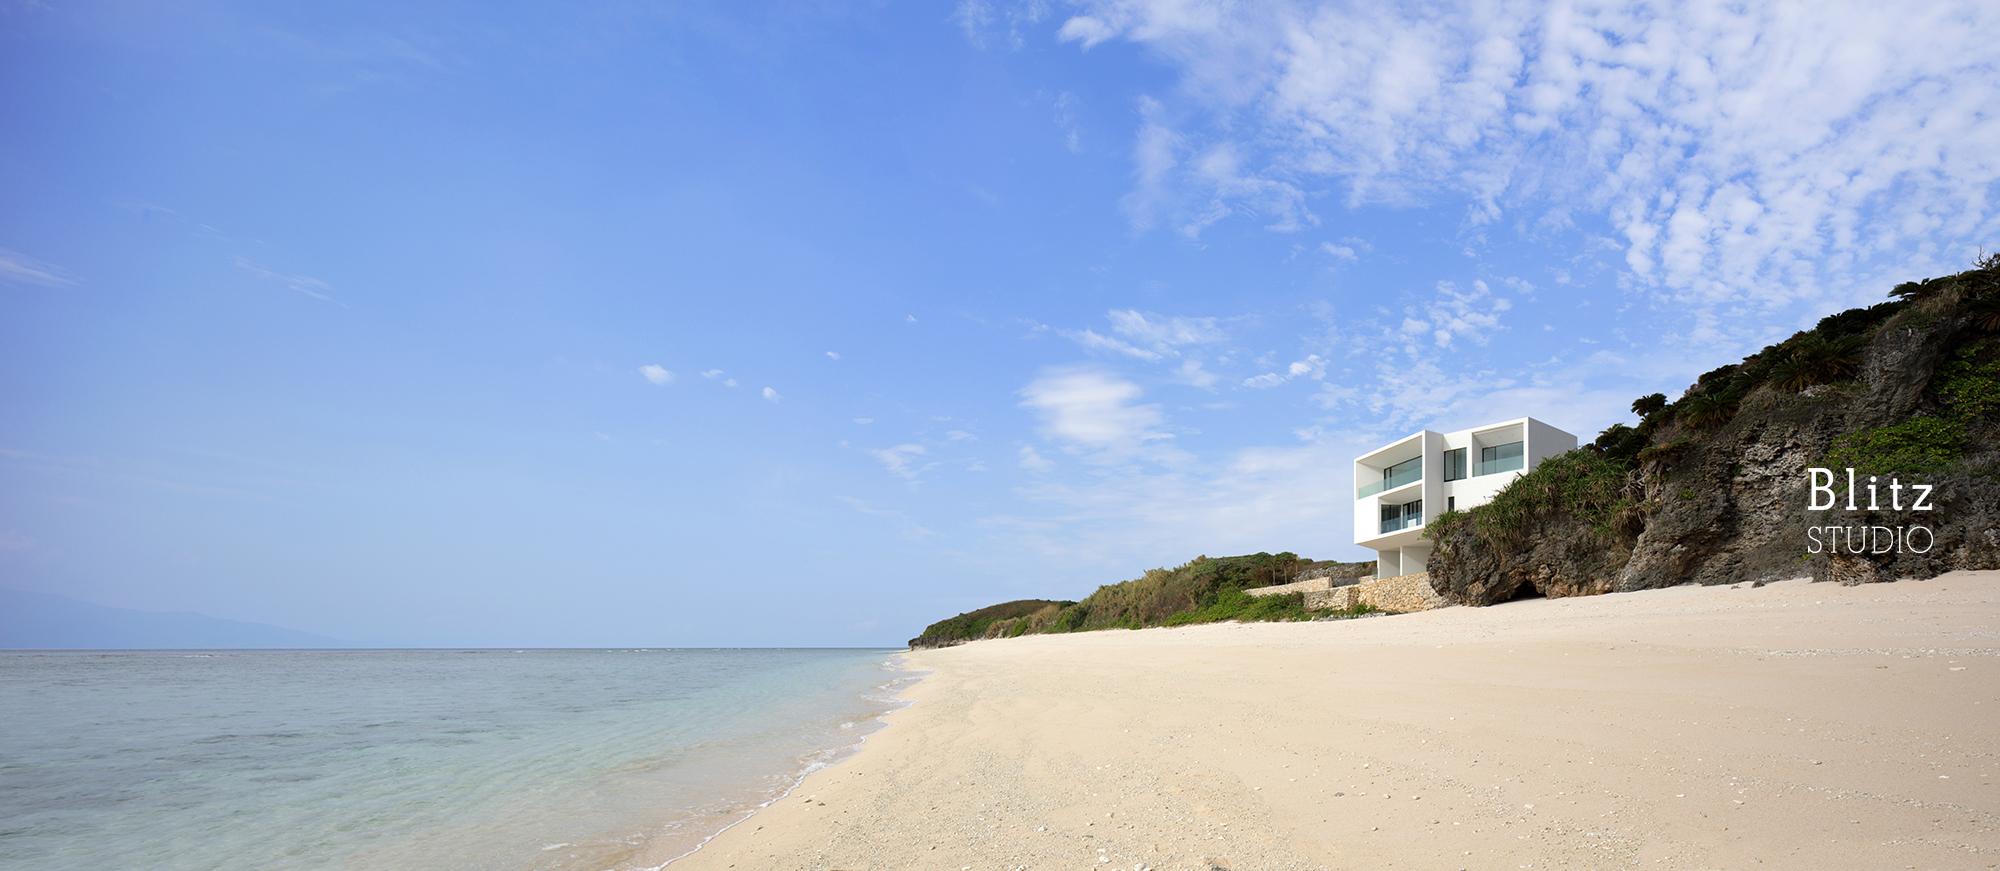 『与論島の家』-鹿児島県与論町-建築写真・竣工写真・インテリア写真5